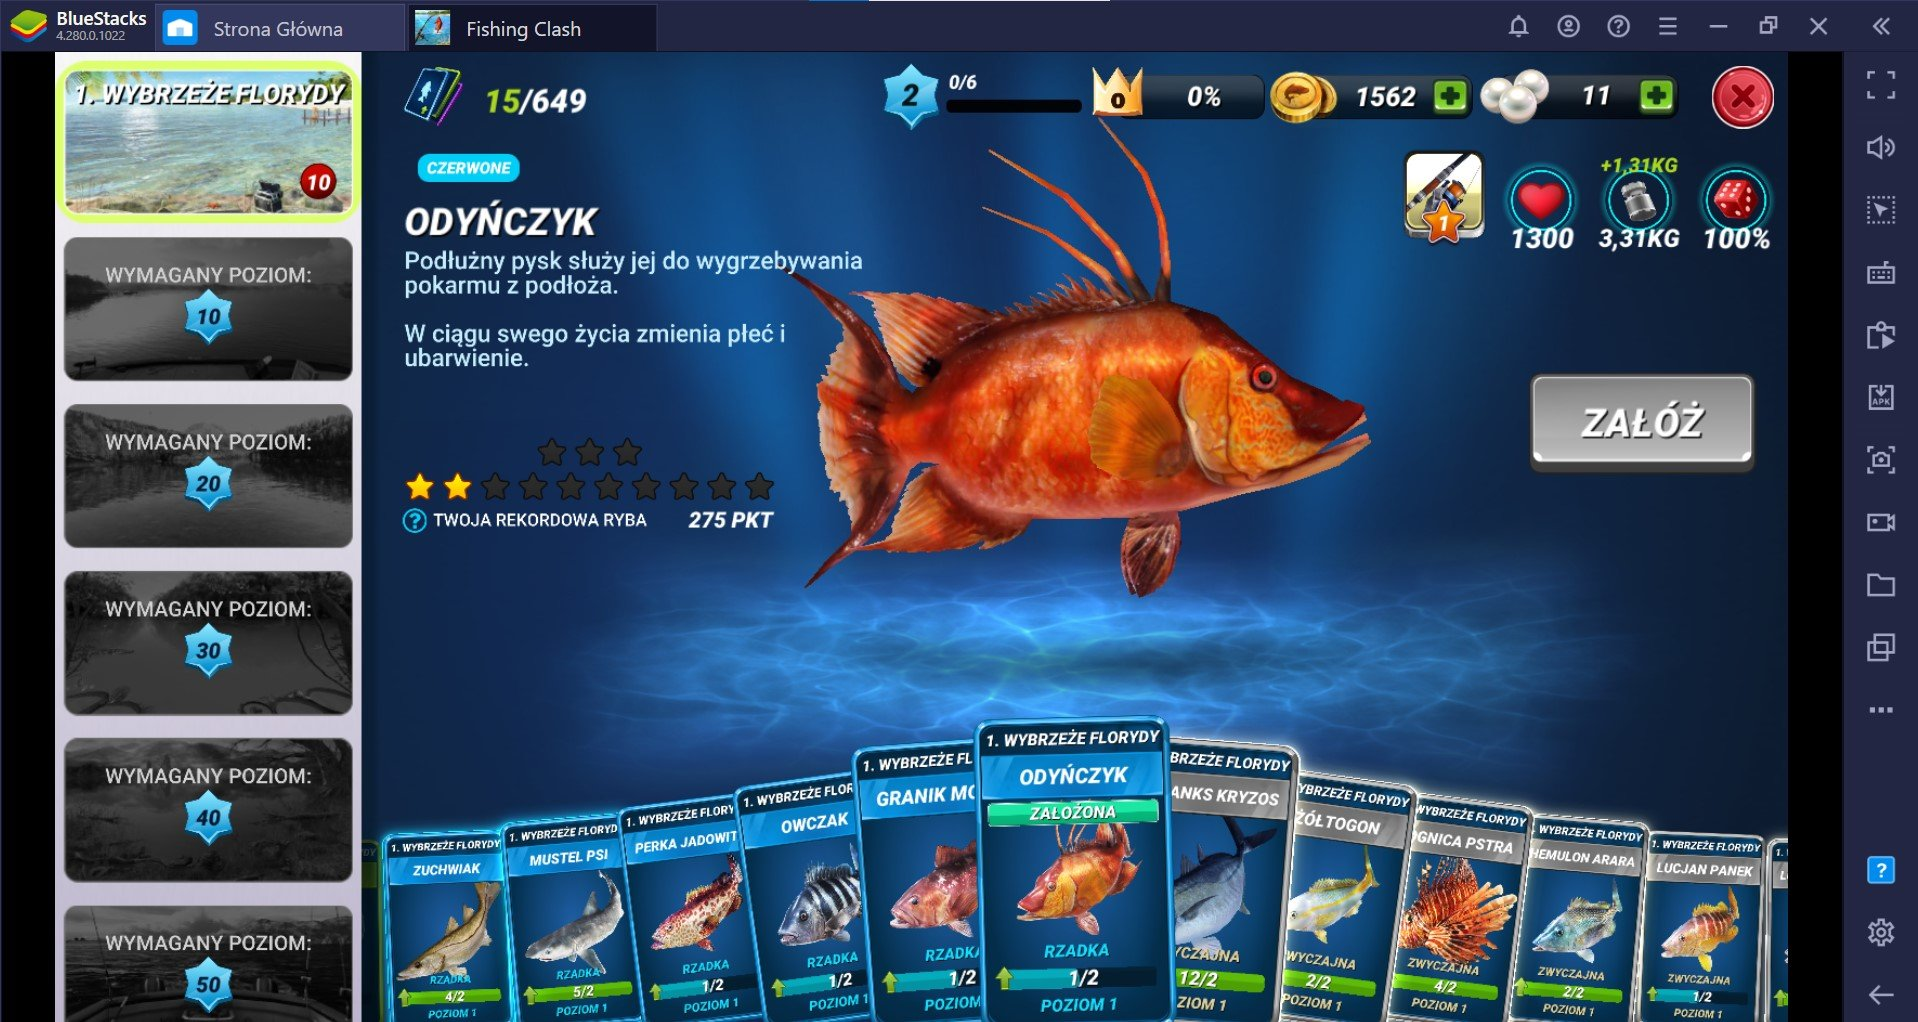 Fishing Clash: Przewodnik po wędkach